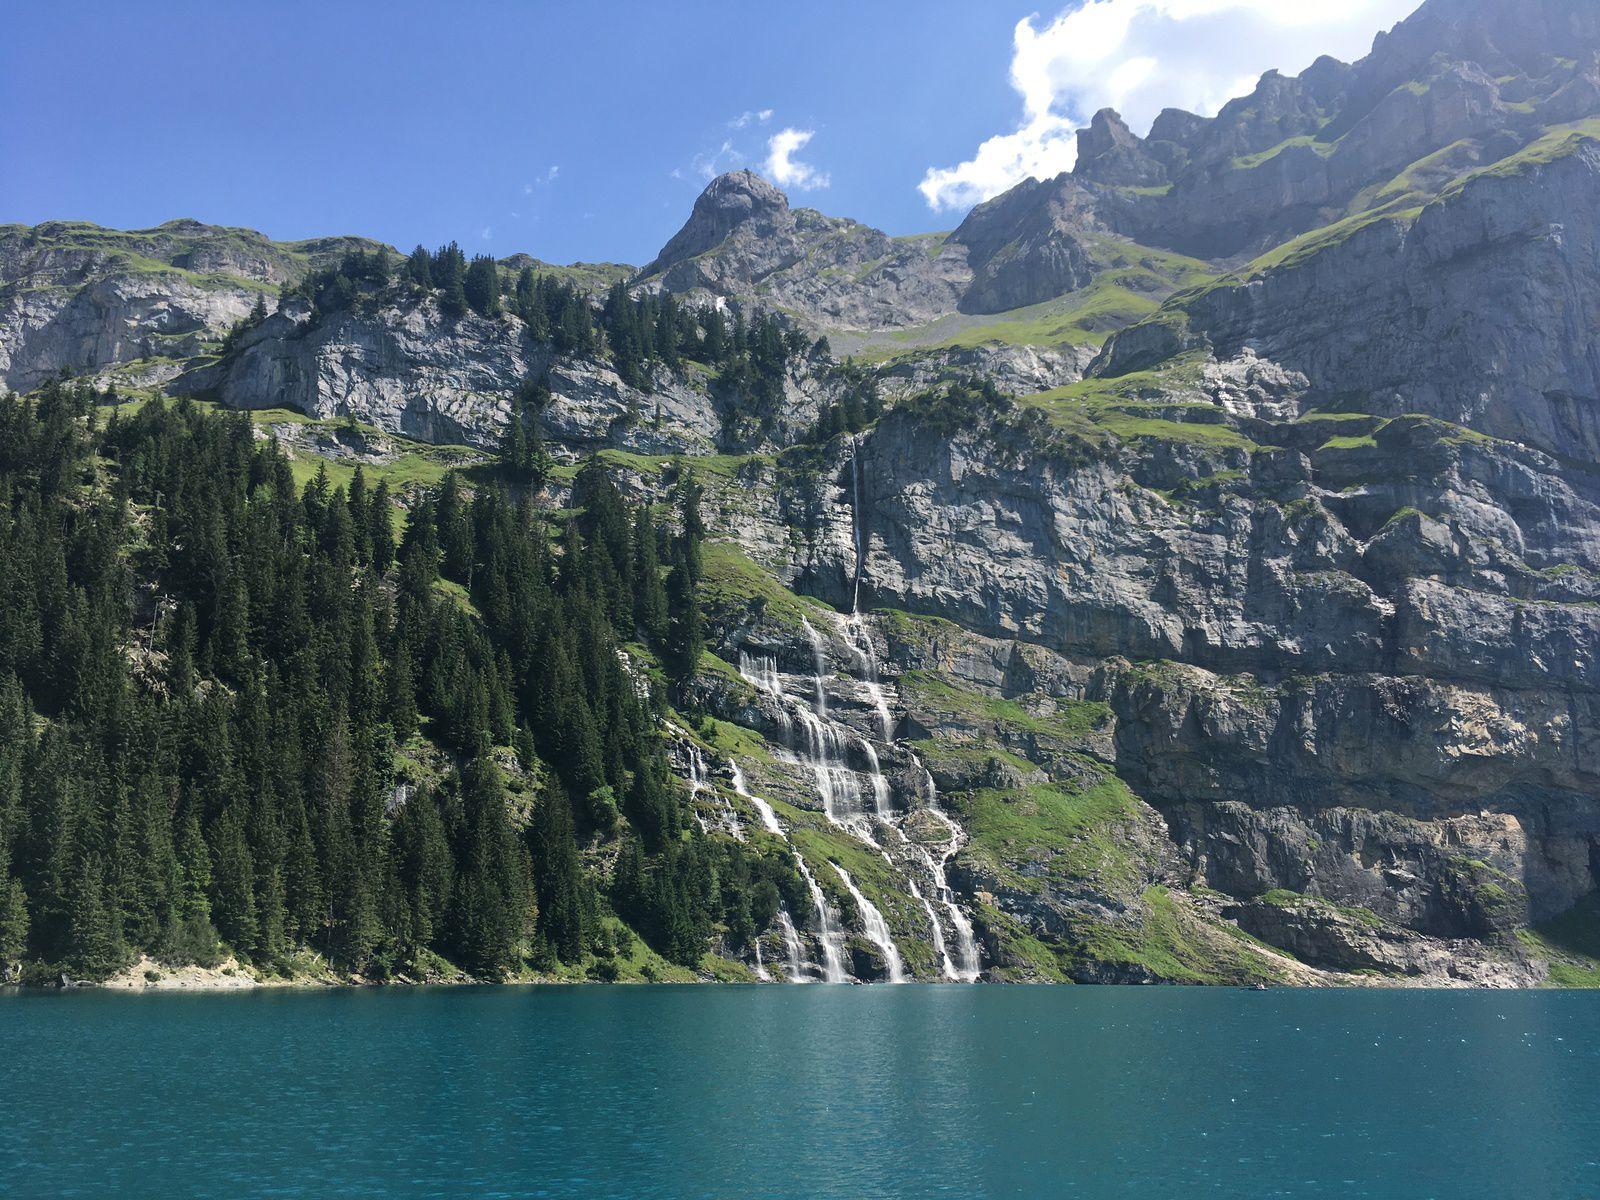 15 août 2021 : Oeschinensee (Suisse)